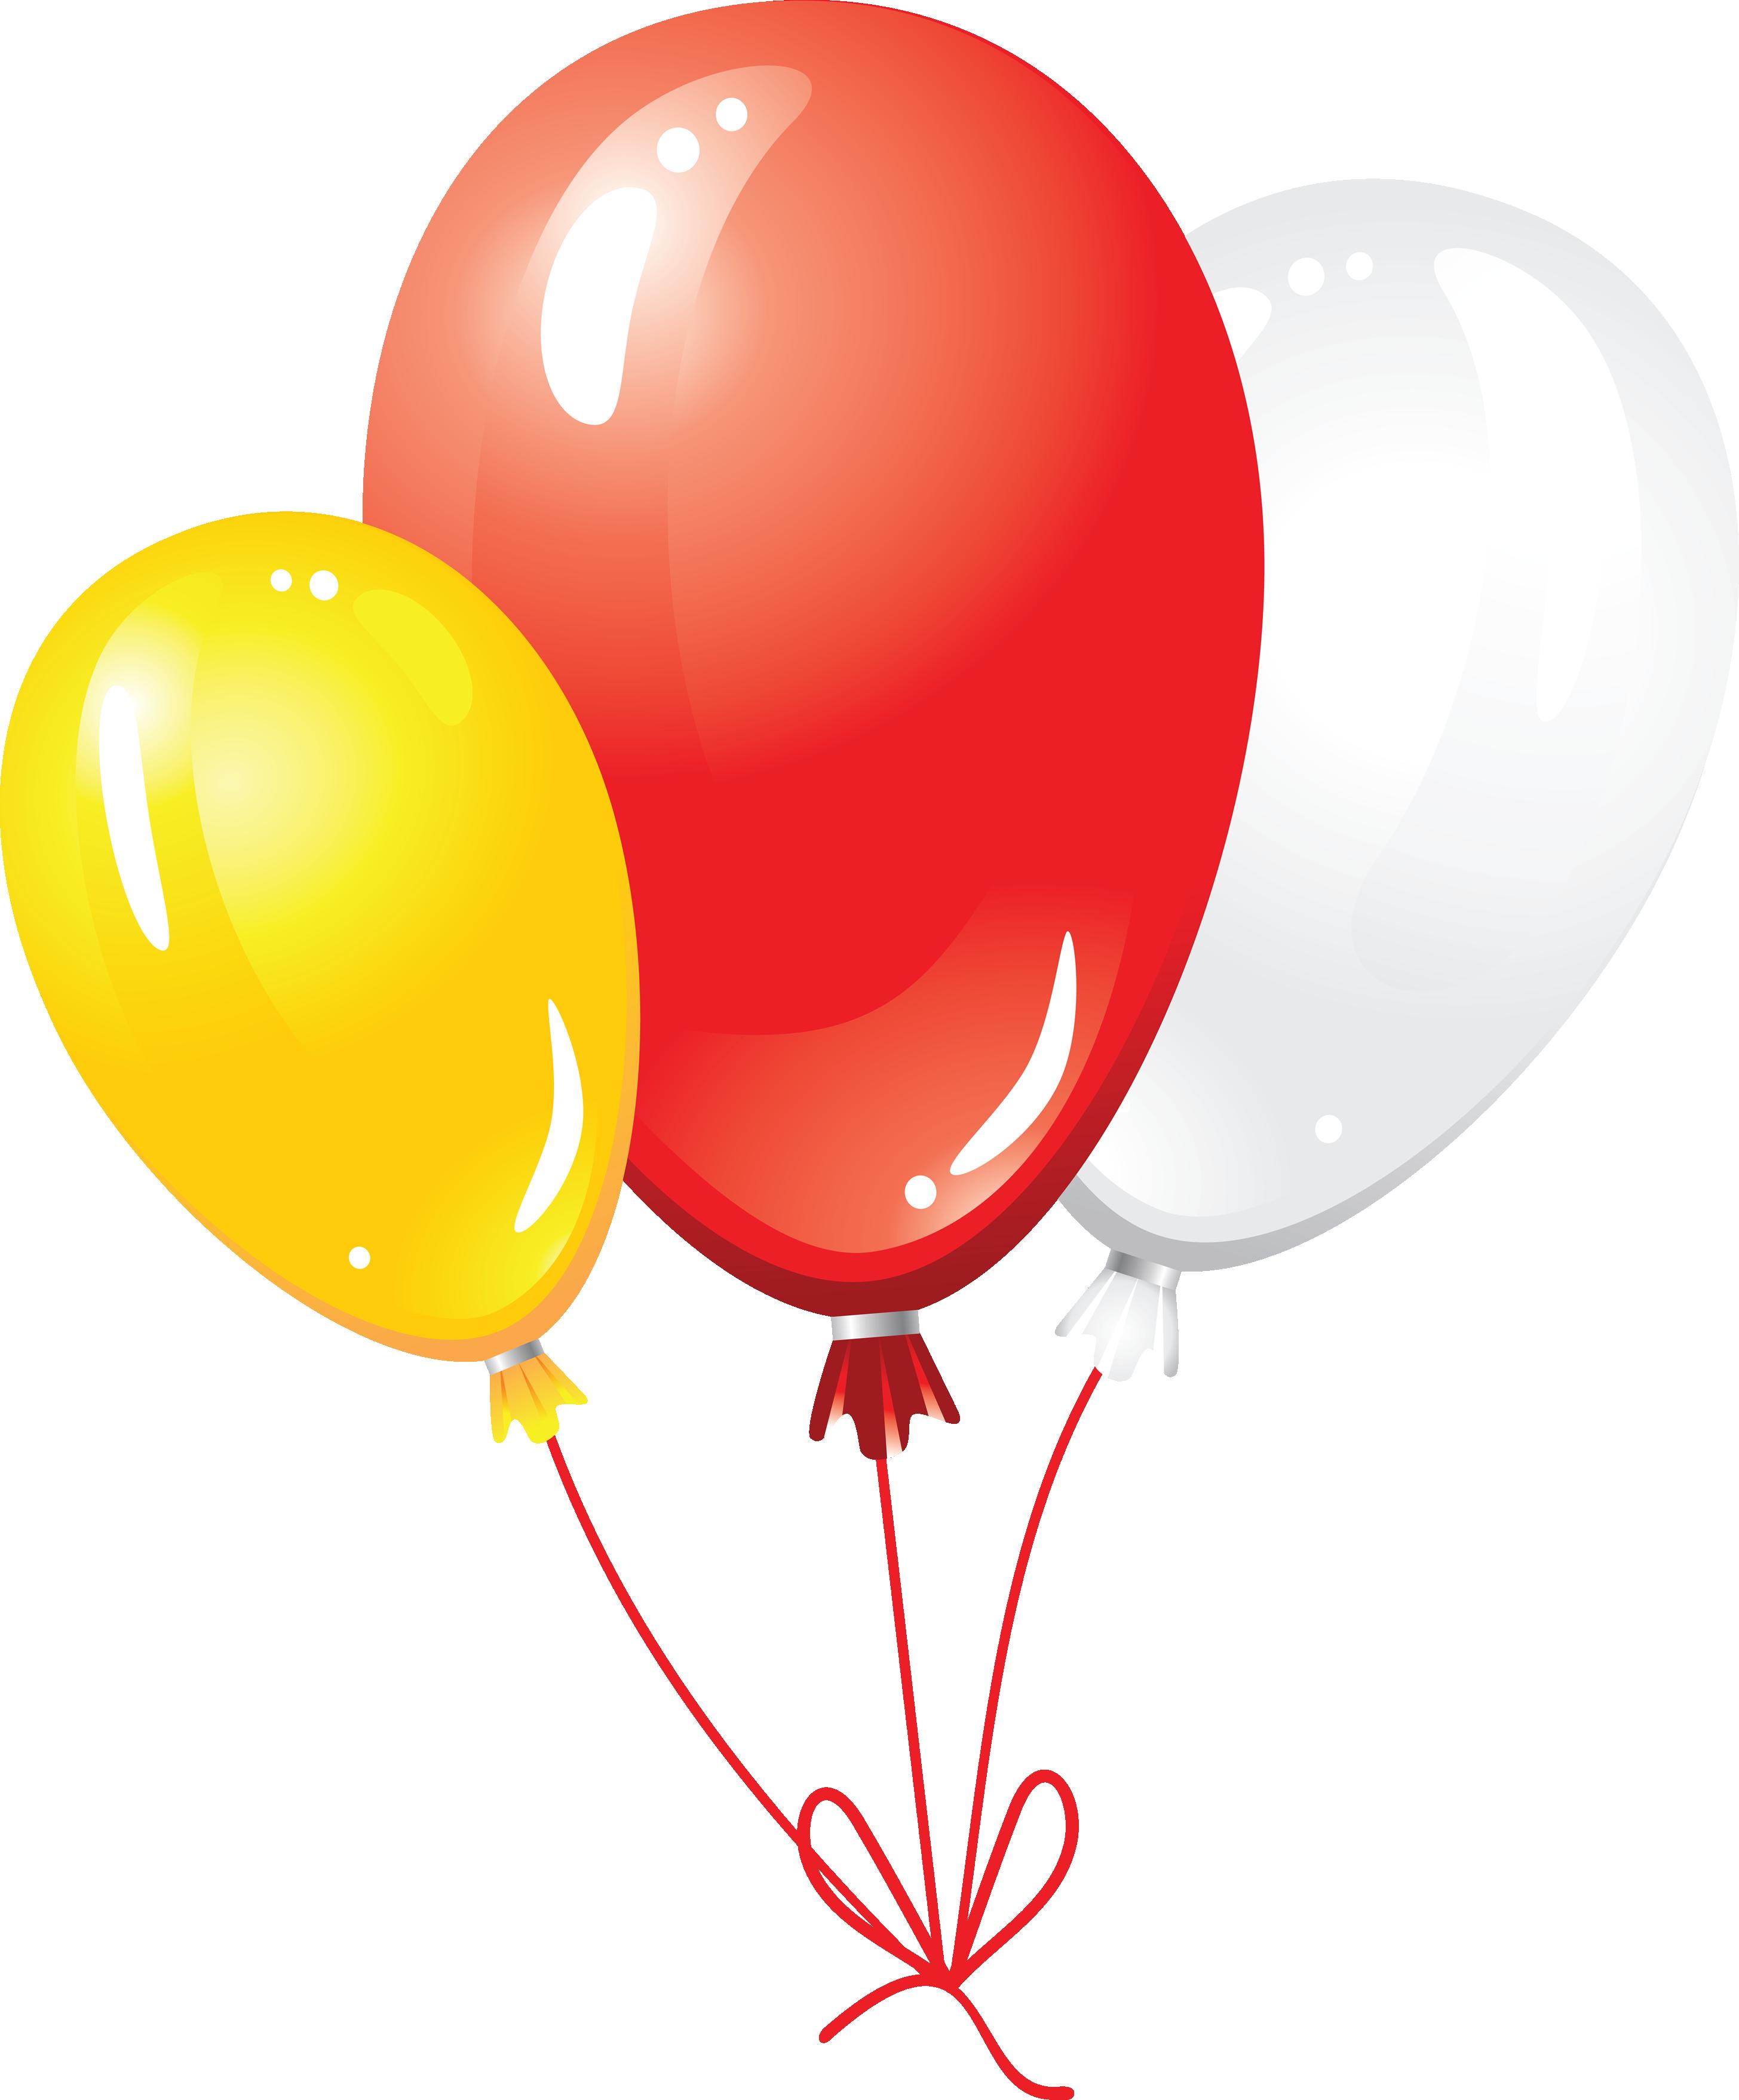 Balloon Png Image - Balloon, Transparent background PNG HD thumbnail